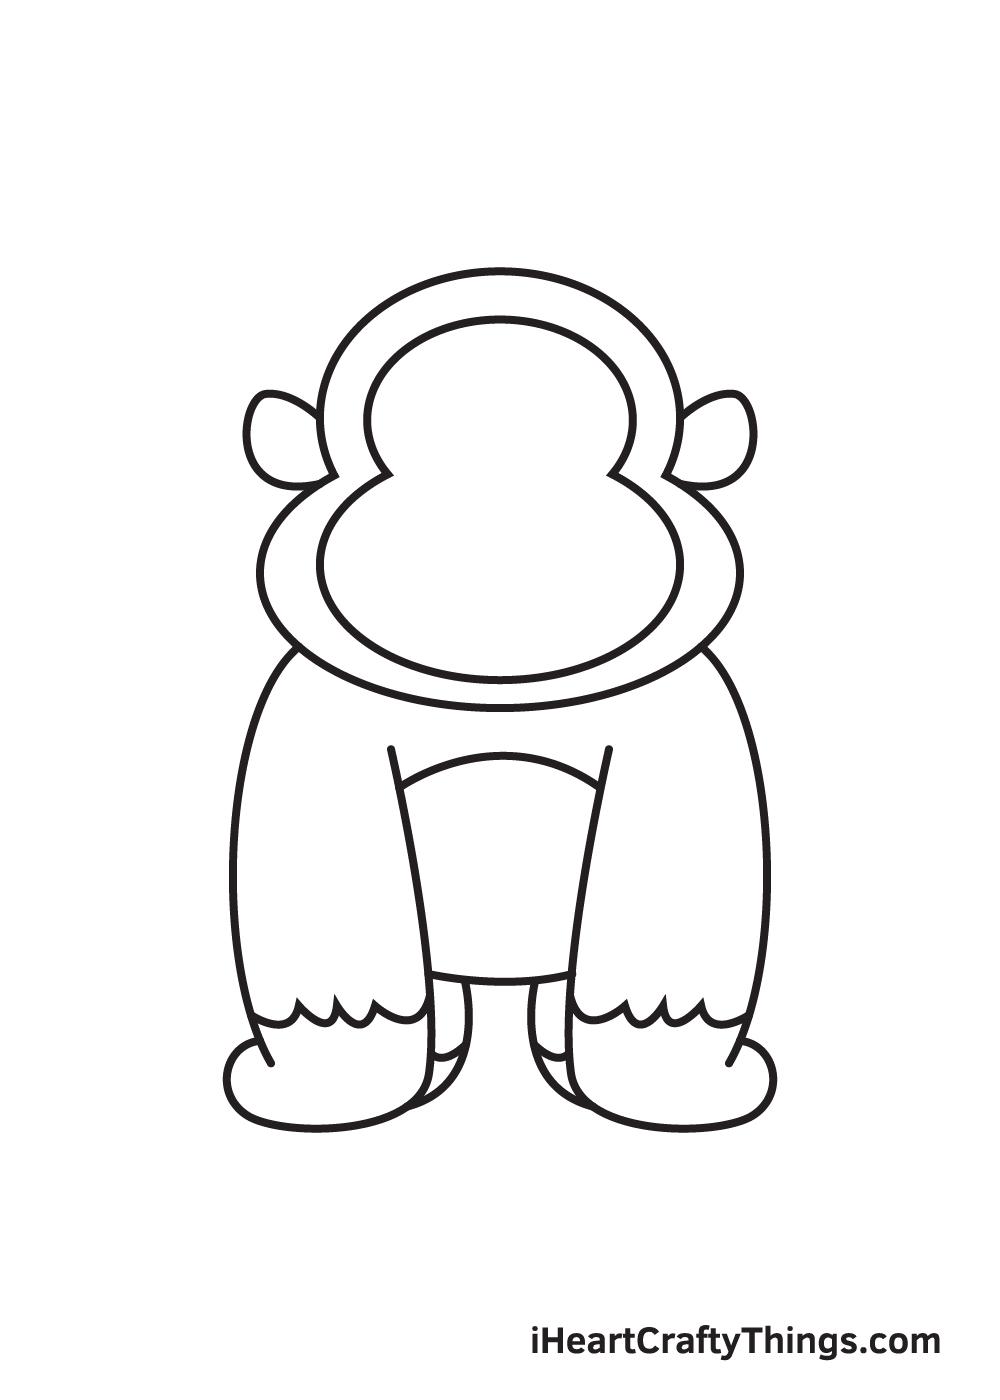 gorilla drawing - step 8